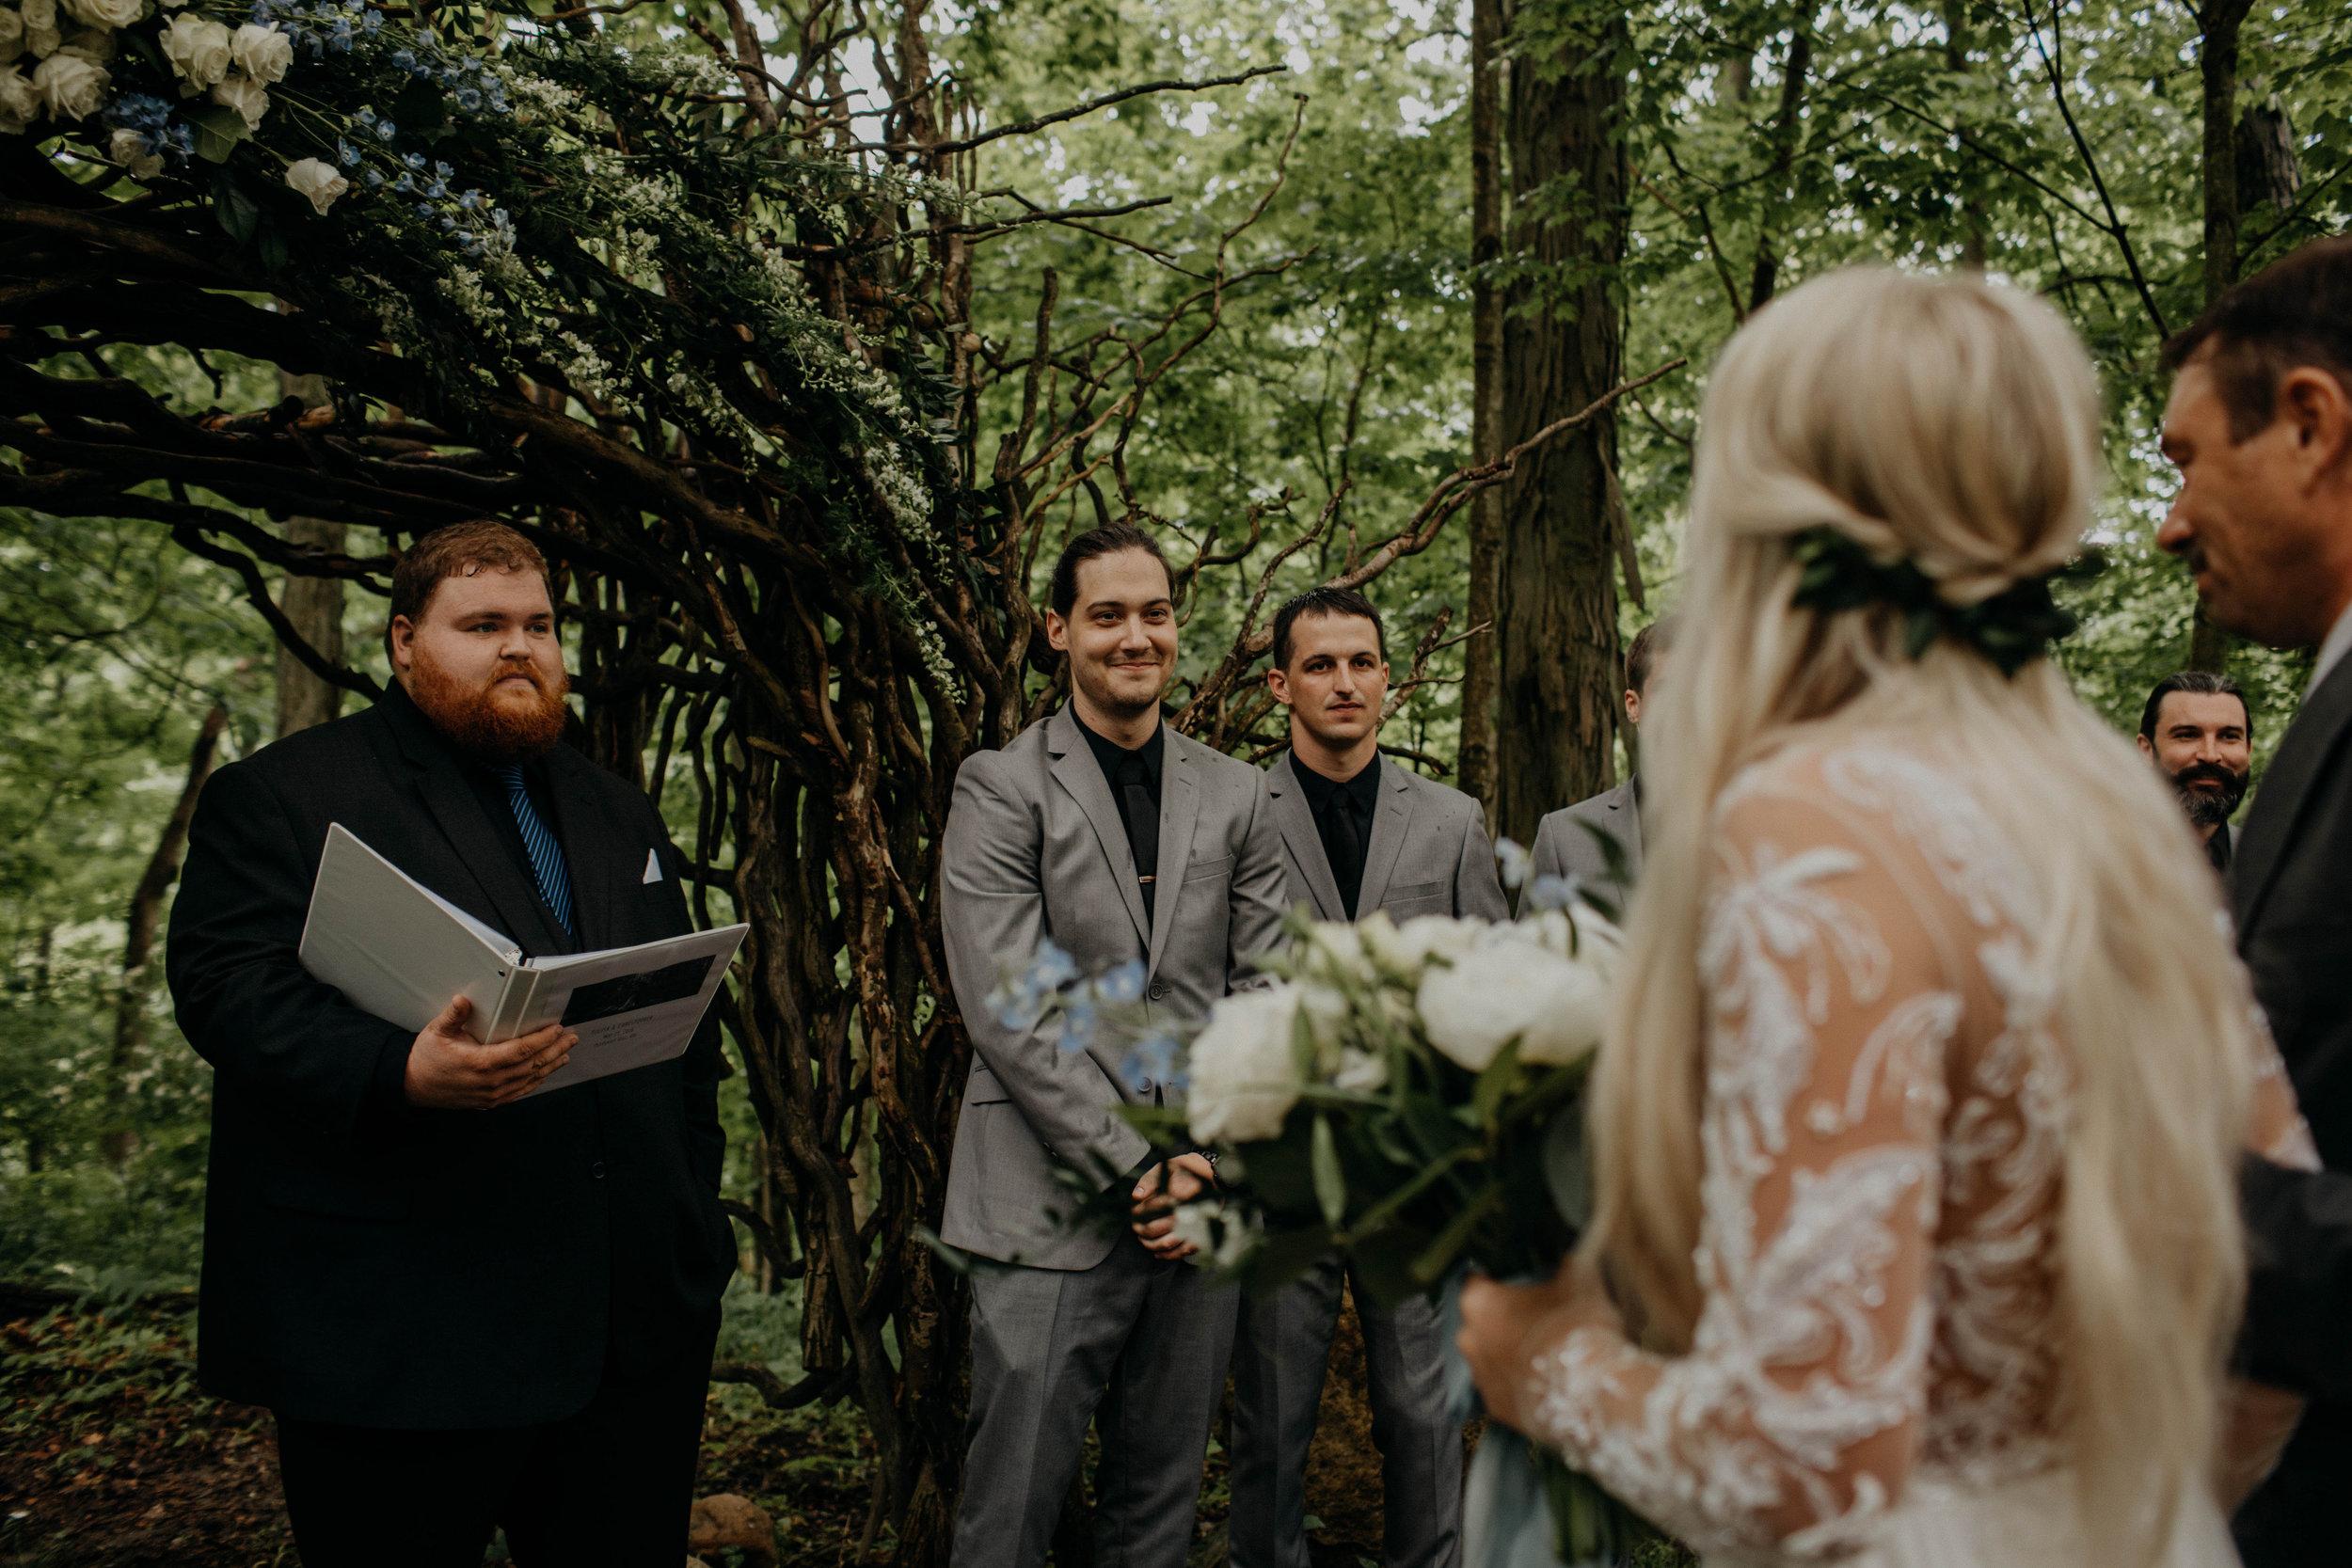 Columbus+ohio+wedding+photographer+canyon+run+ranch+wedding+grace+e+jones+photography+wedding+photographer87.jpg